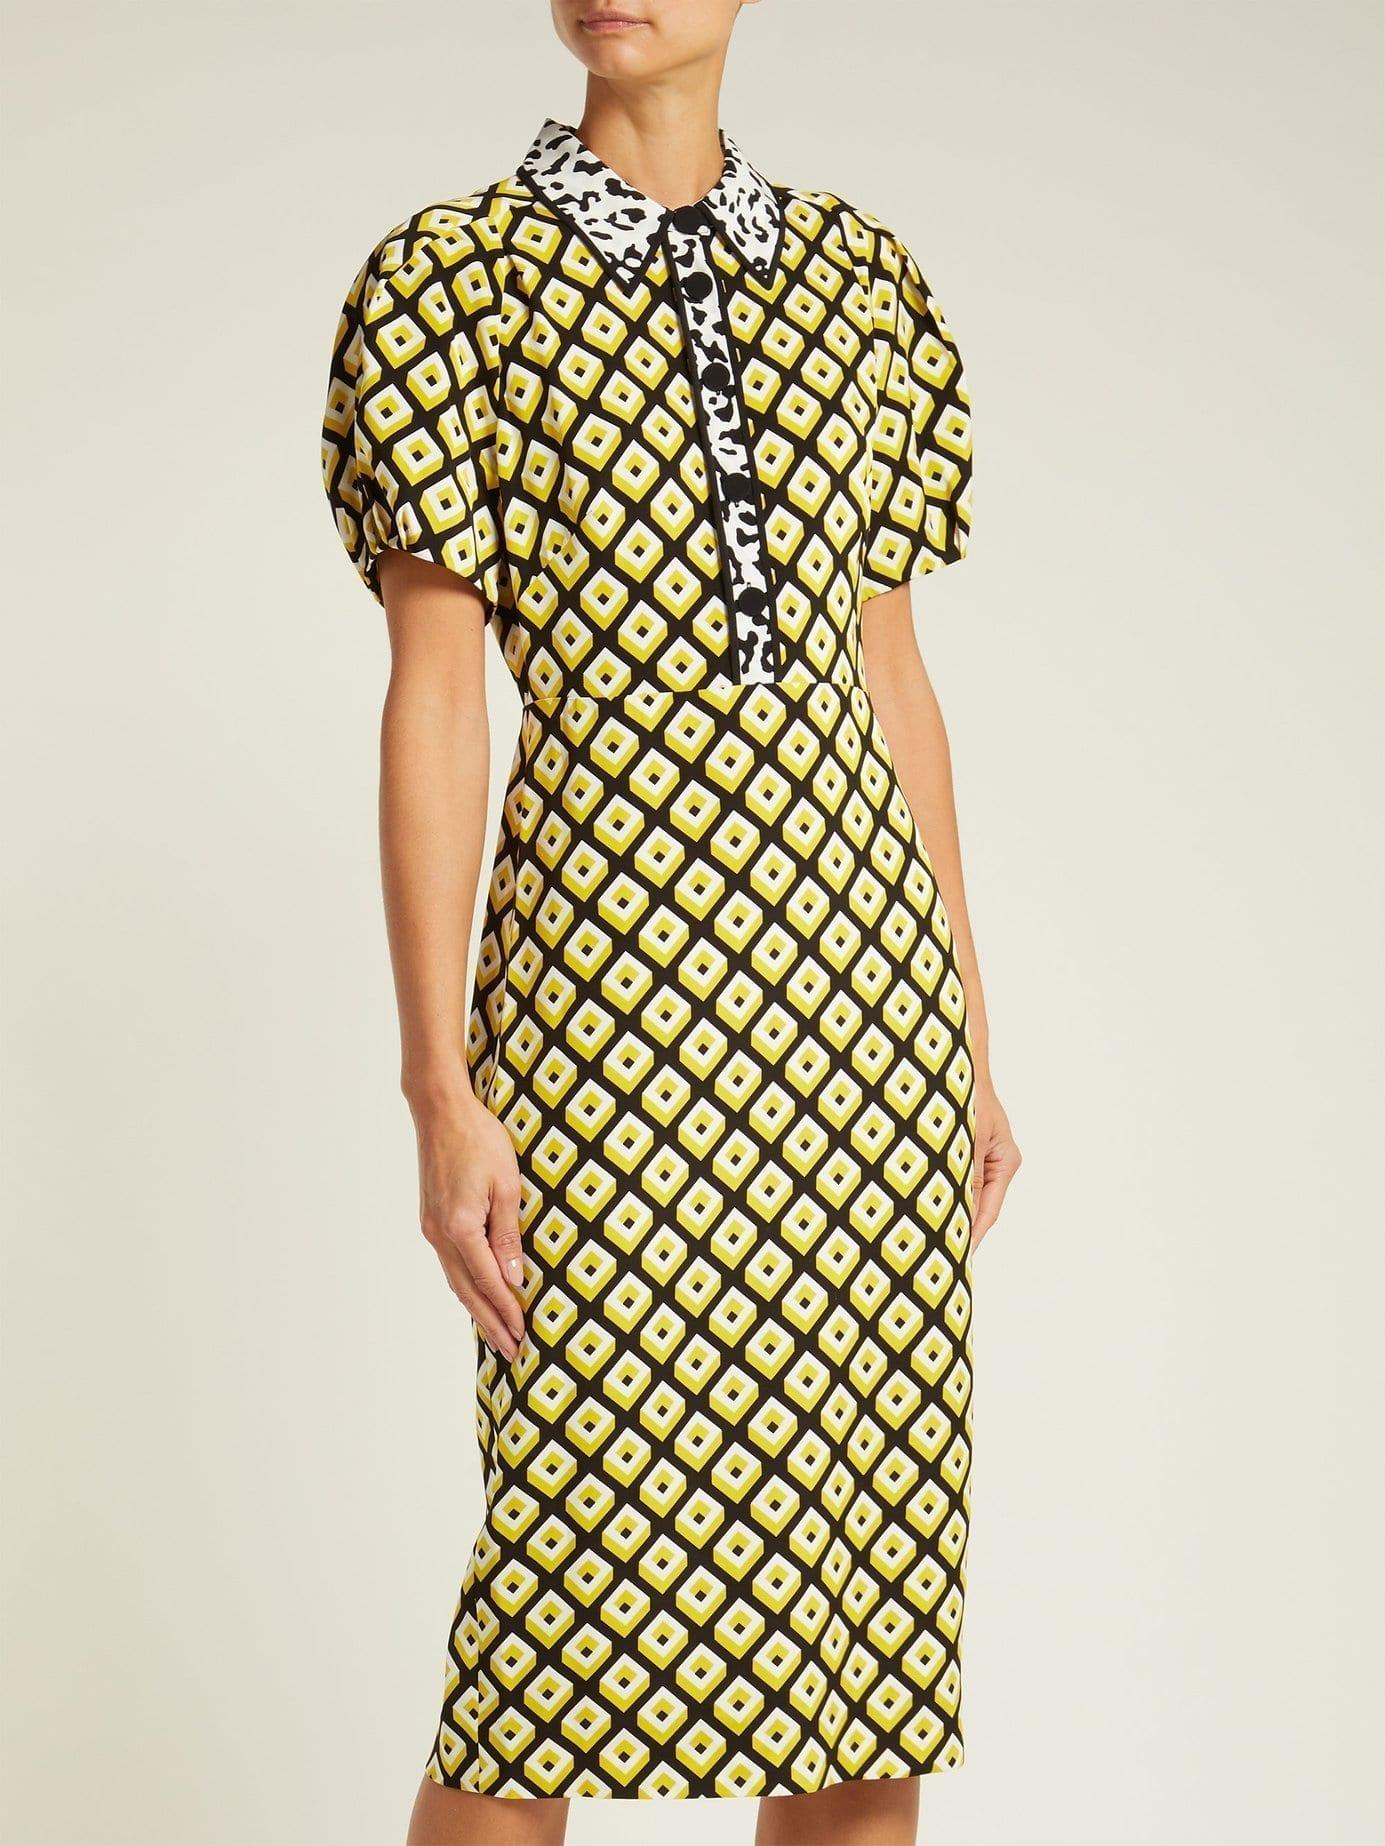 Diane Von Furstenberg Elly Crepe Midi Yellow Dress We